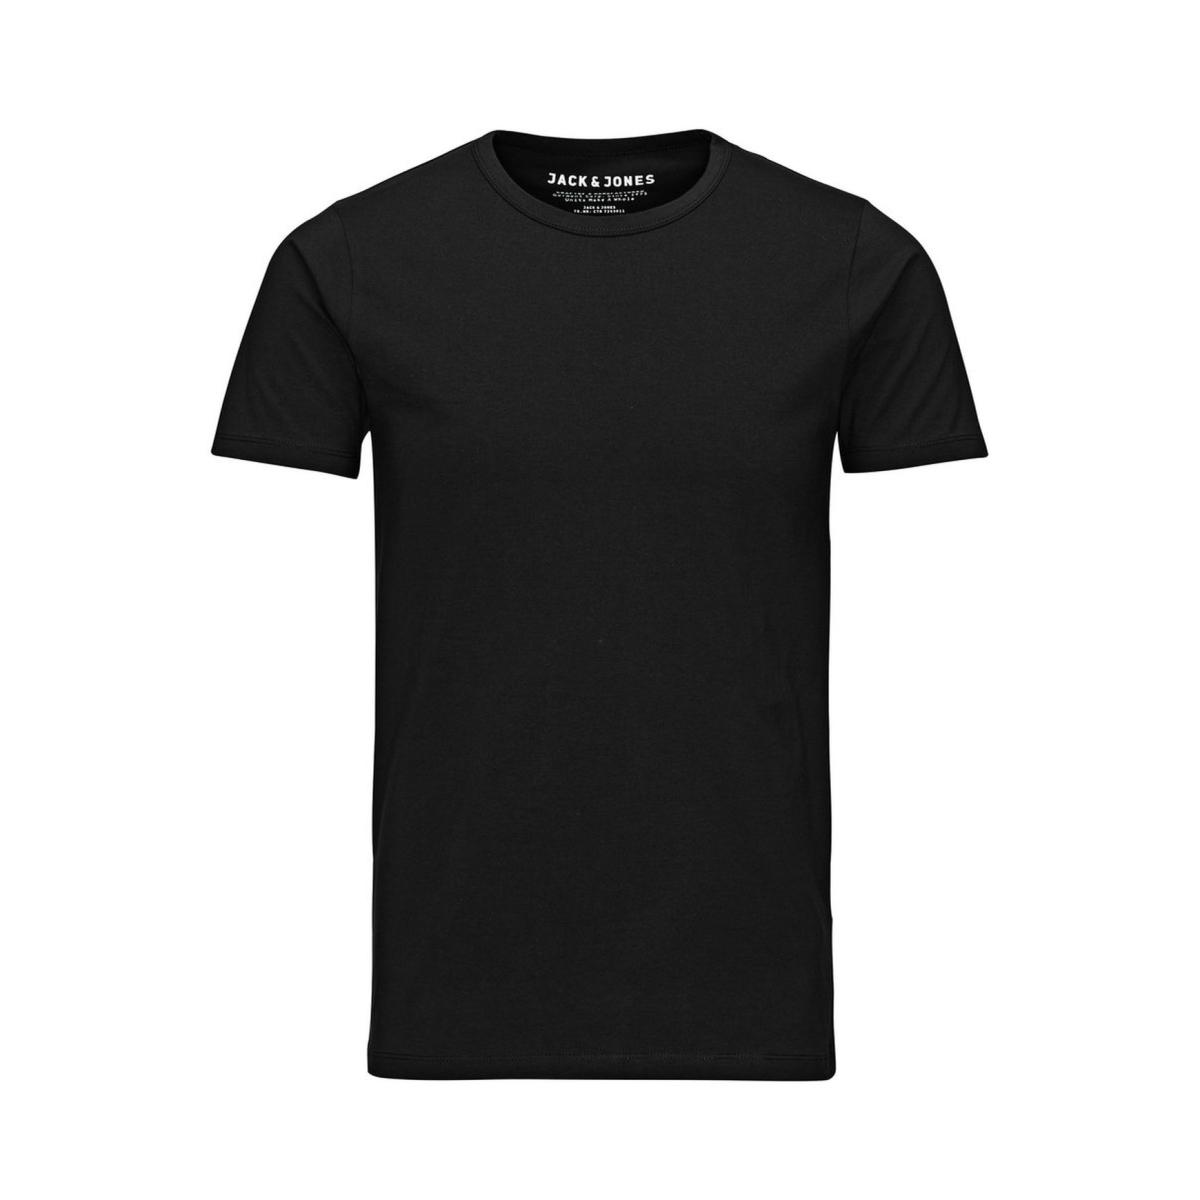 basic o-neck tee s/s noos jack & jones t-shirt black